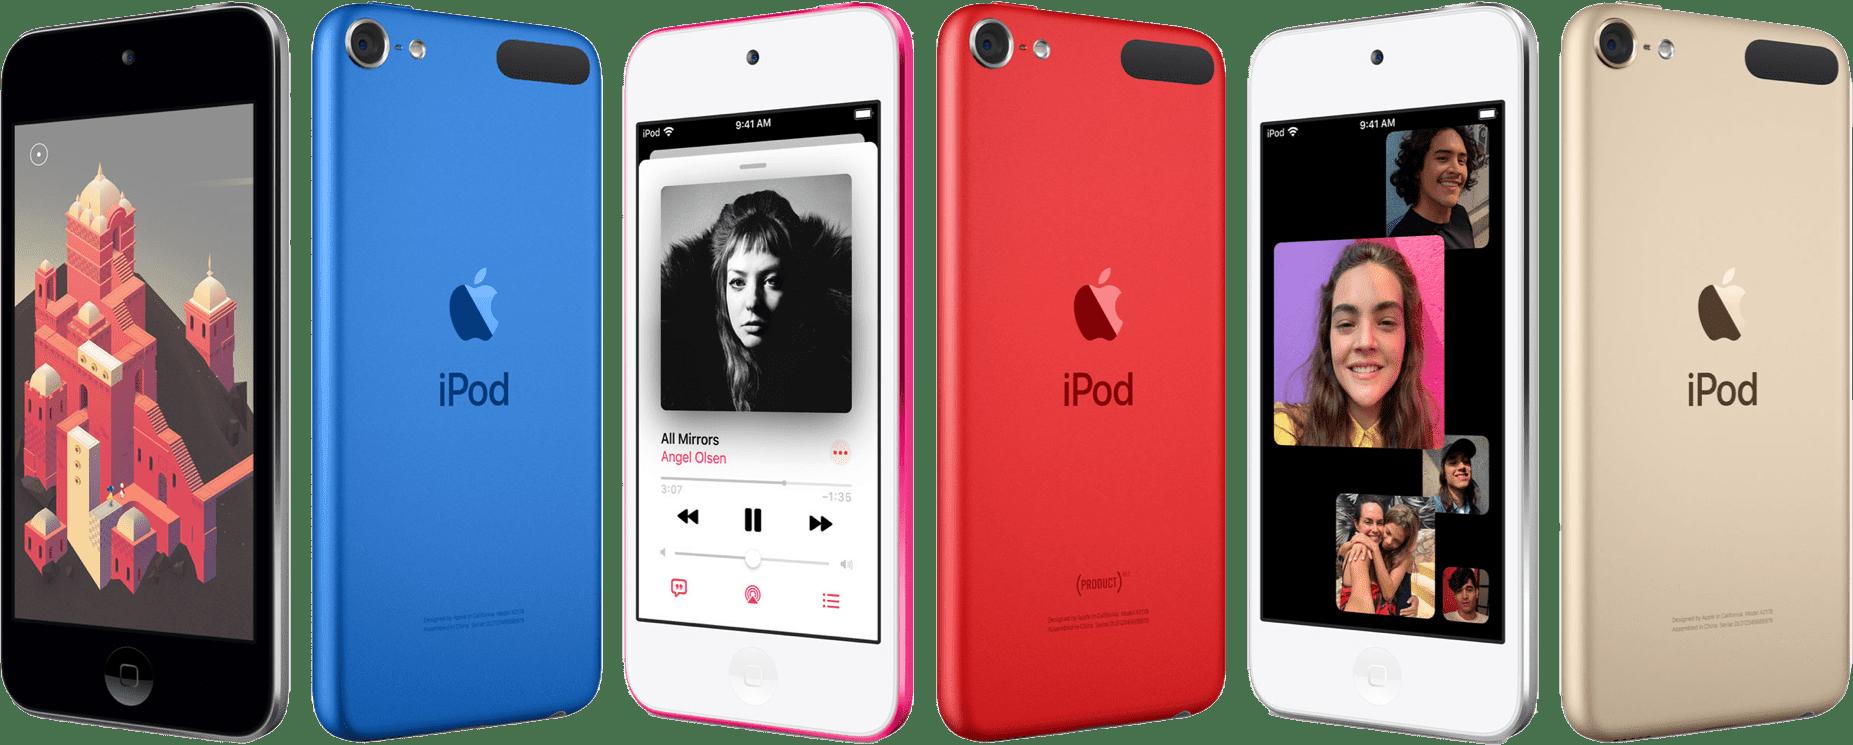 allapplenews_iPod touch